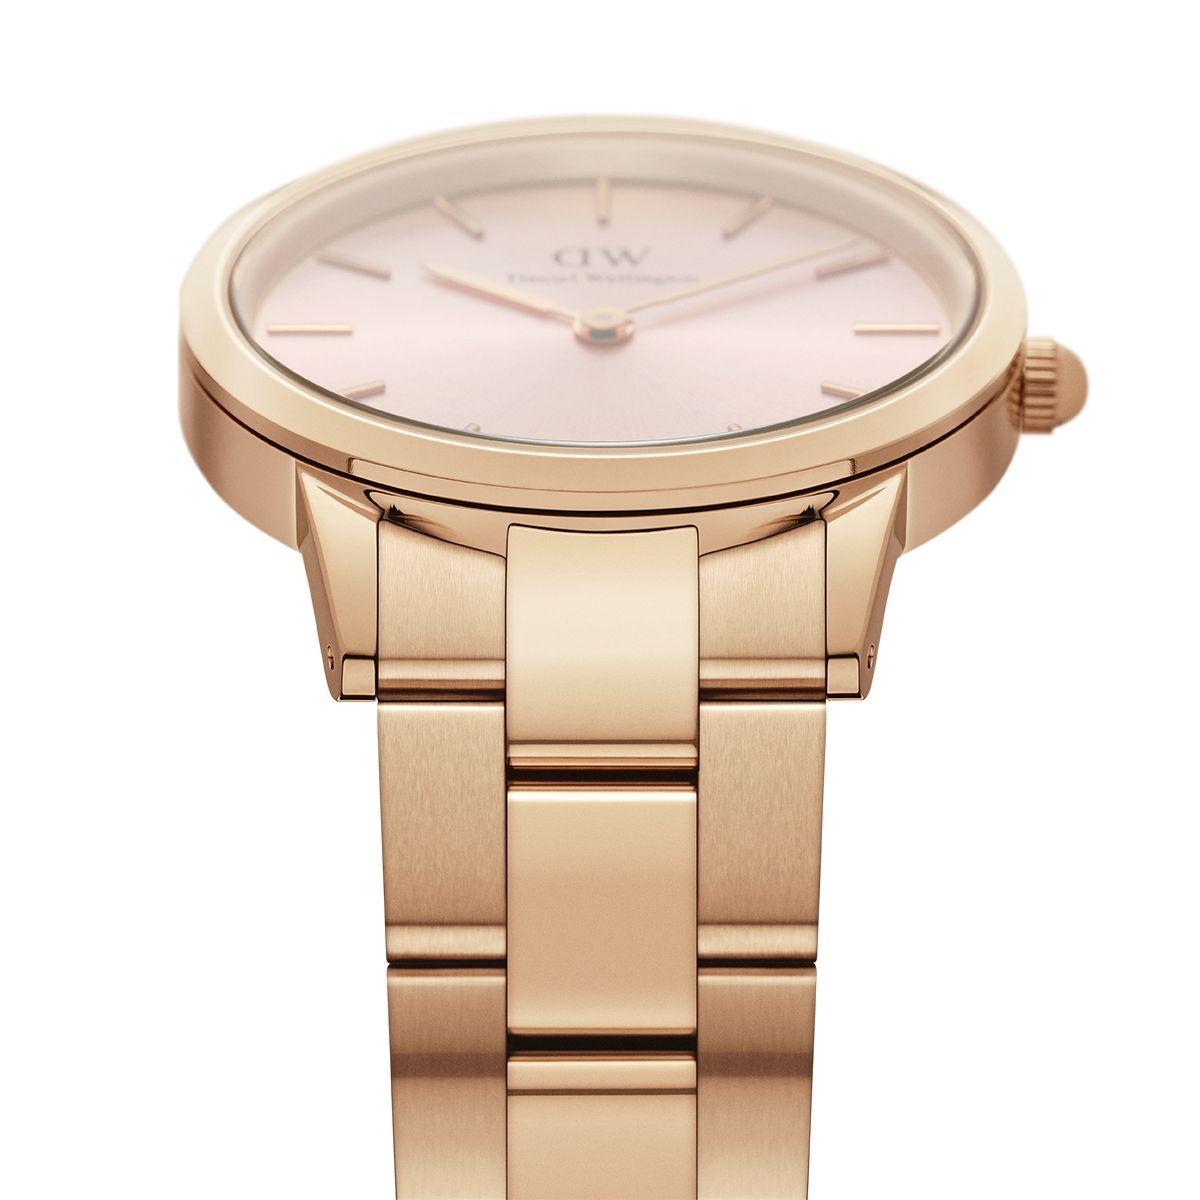 dw官网 dw手表官网 dw中国官网 dw官方旗舰店 DW DW官网  Watch Iconic Link RG Pink 28mm